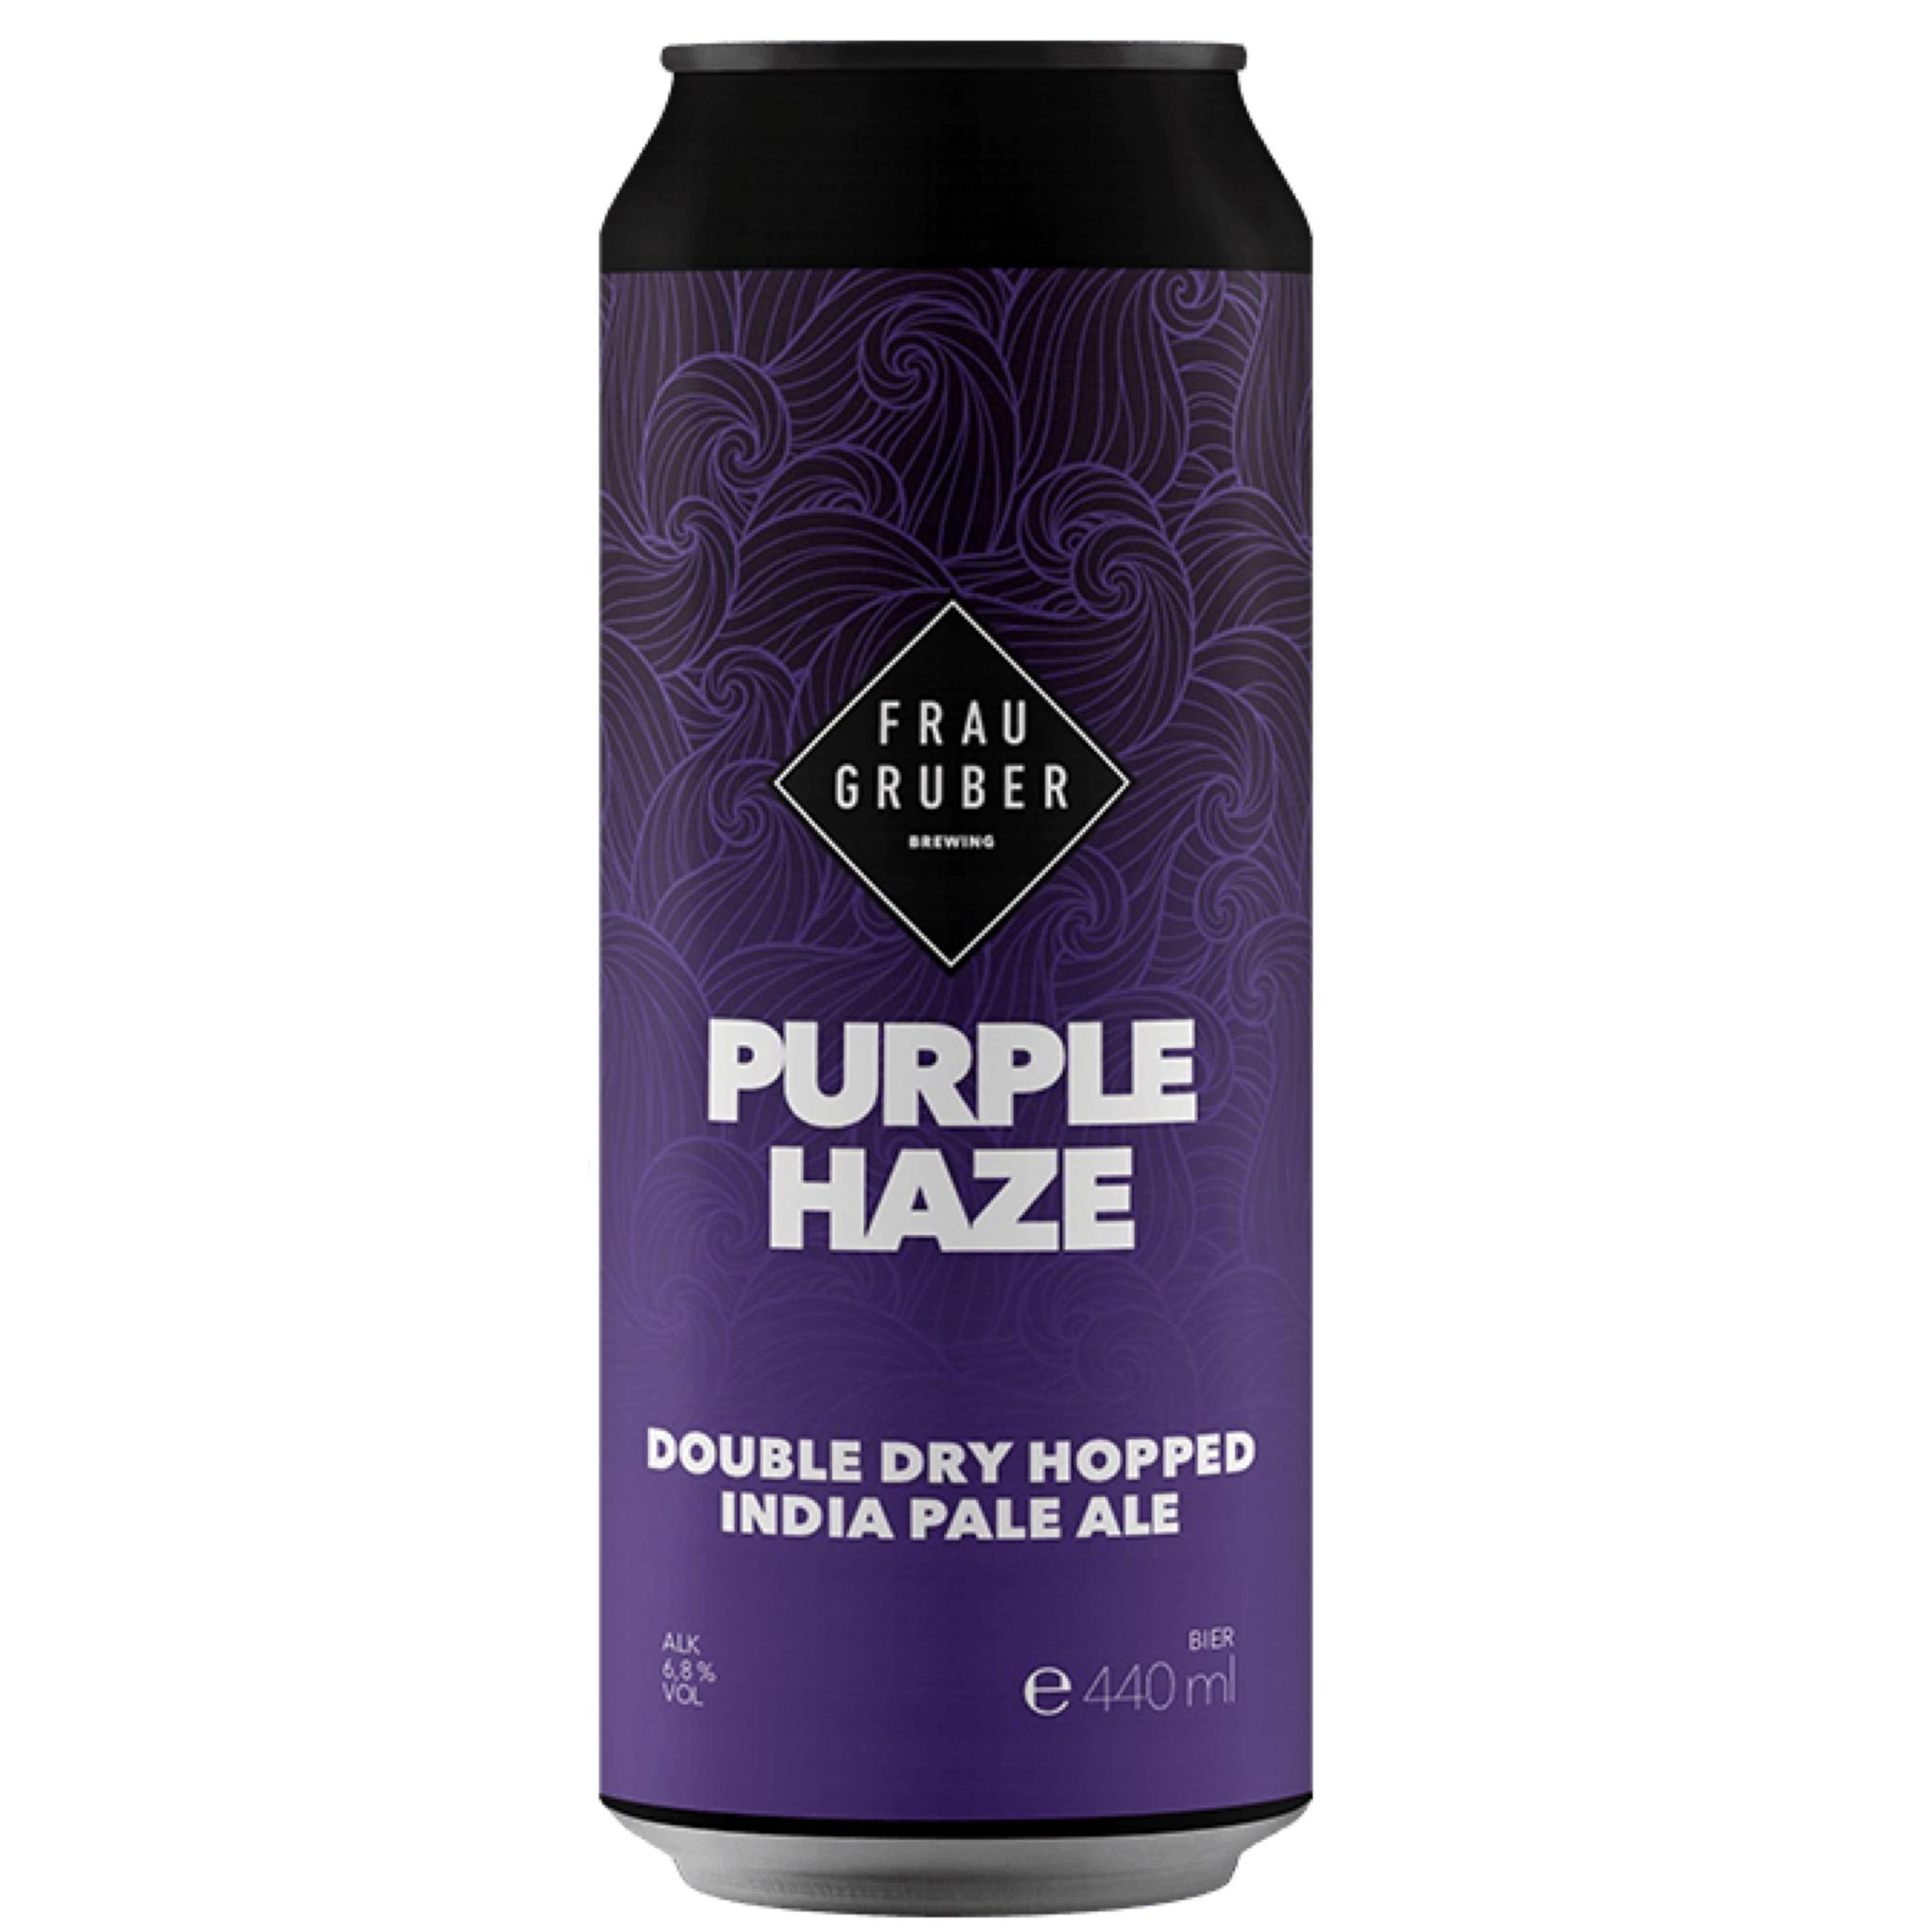 Purple Haze DDH IPA 6.8% 440ml Frau Gruber